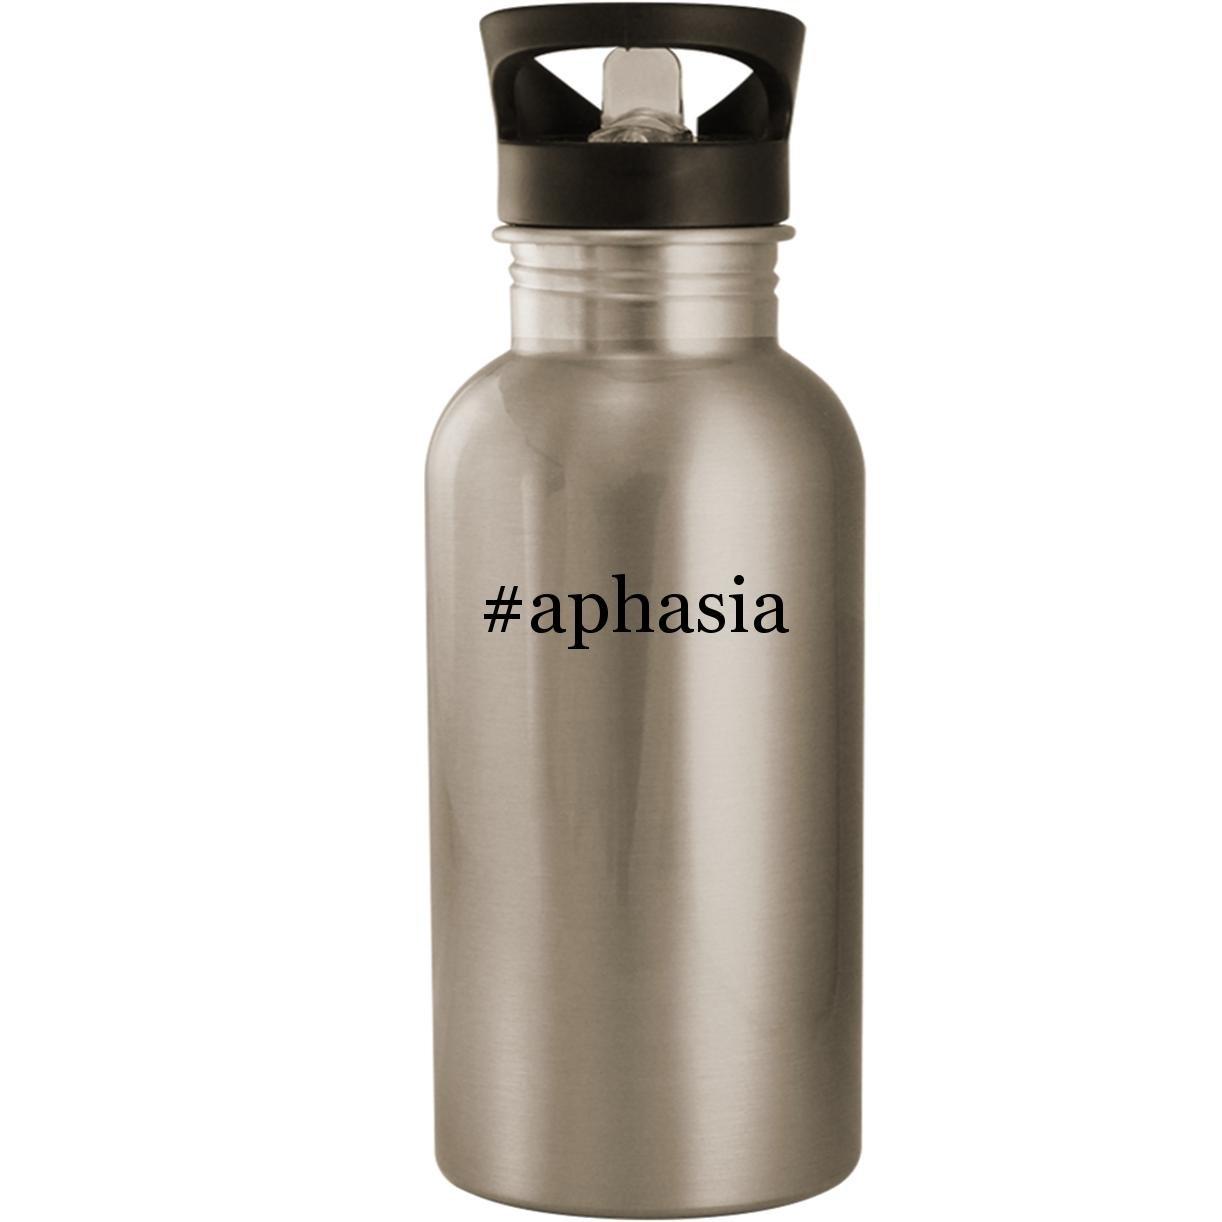 # aphasia – ステンレススチール20oz Road Ready水ボトル シルバー US-C-07-18-02-002841-04-26-18-26 B07FTW6H65 シルバー